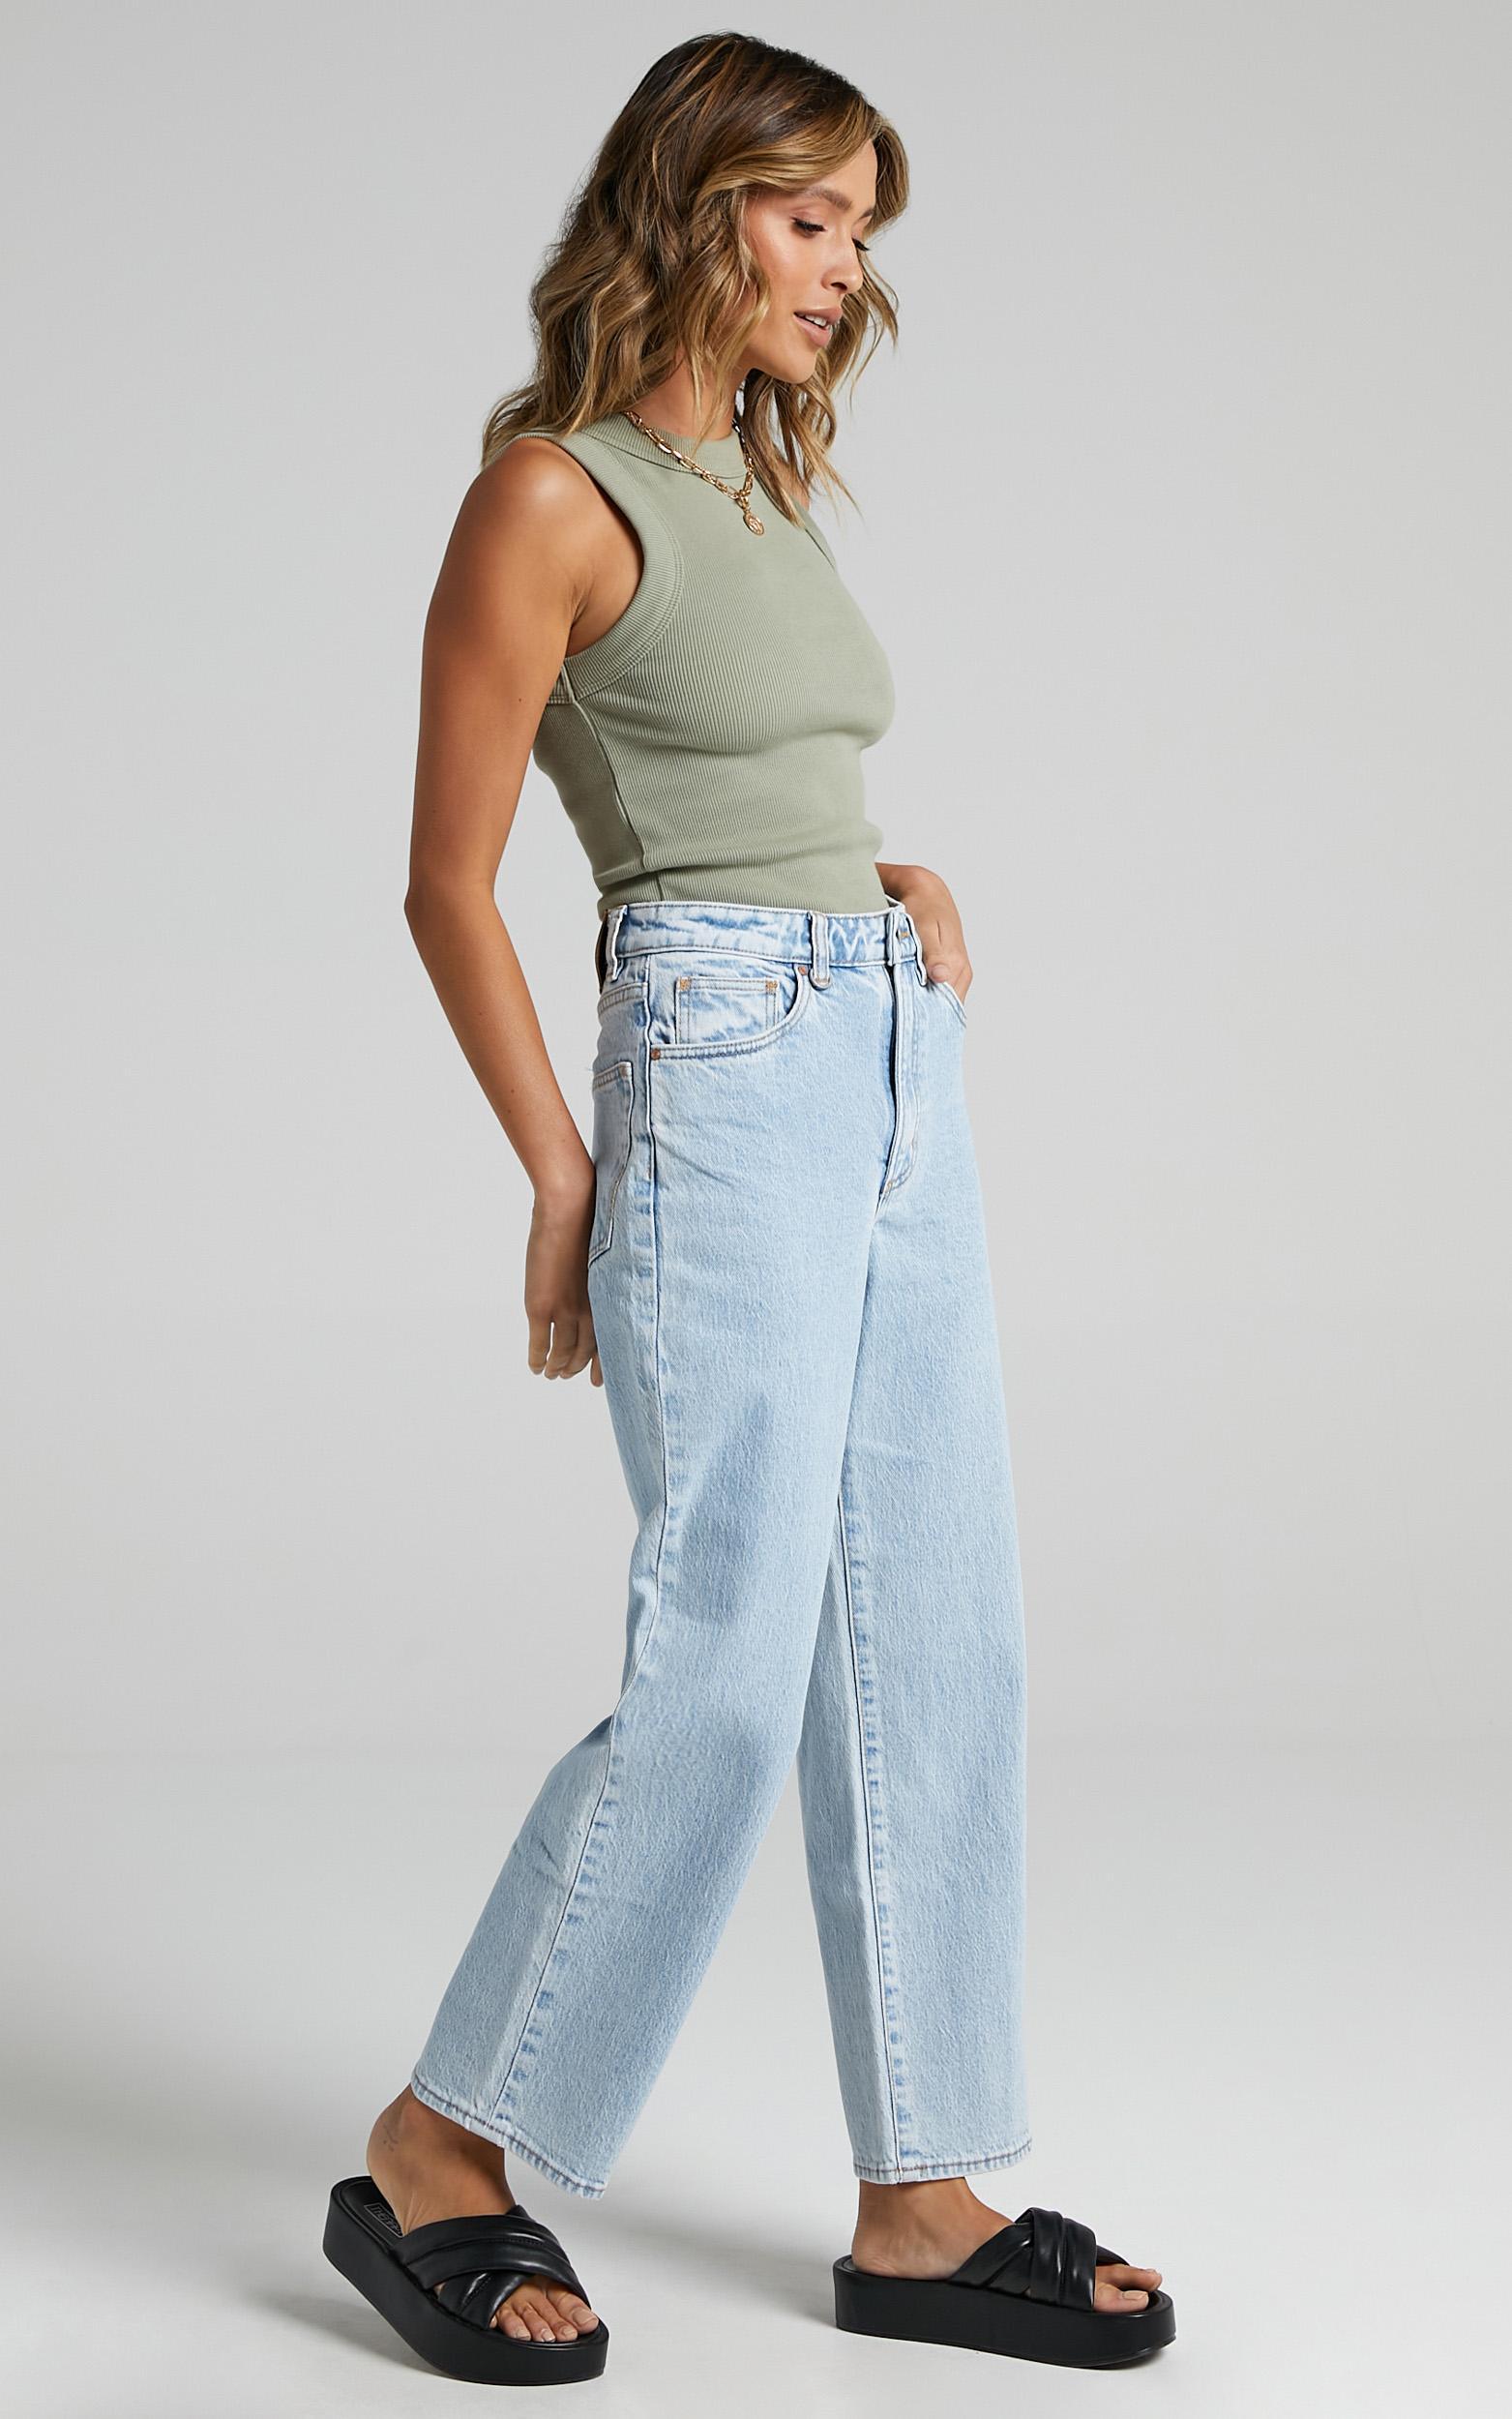 Neuw - Edie Straight Jean in Zero Vinyl - 6 (XS), Blue, hi-res image number null